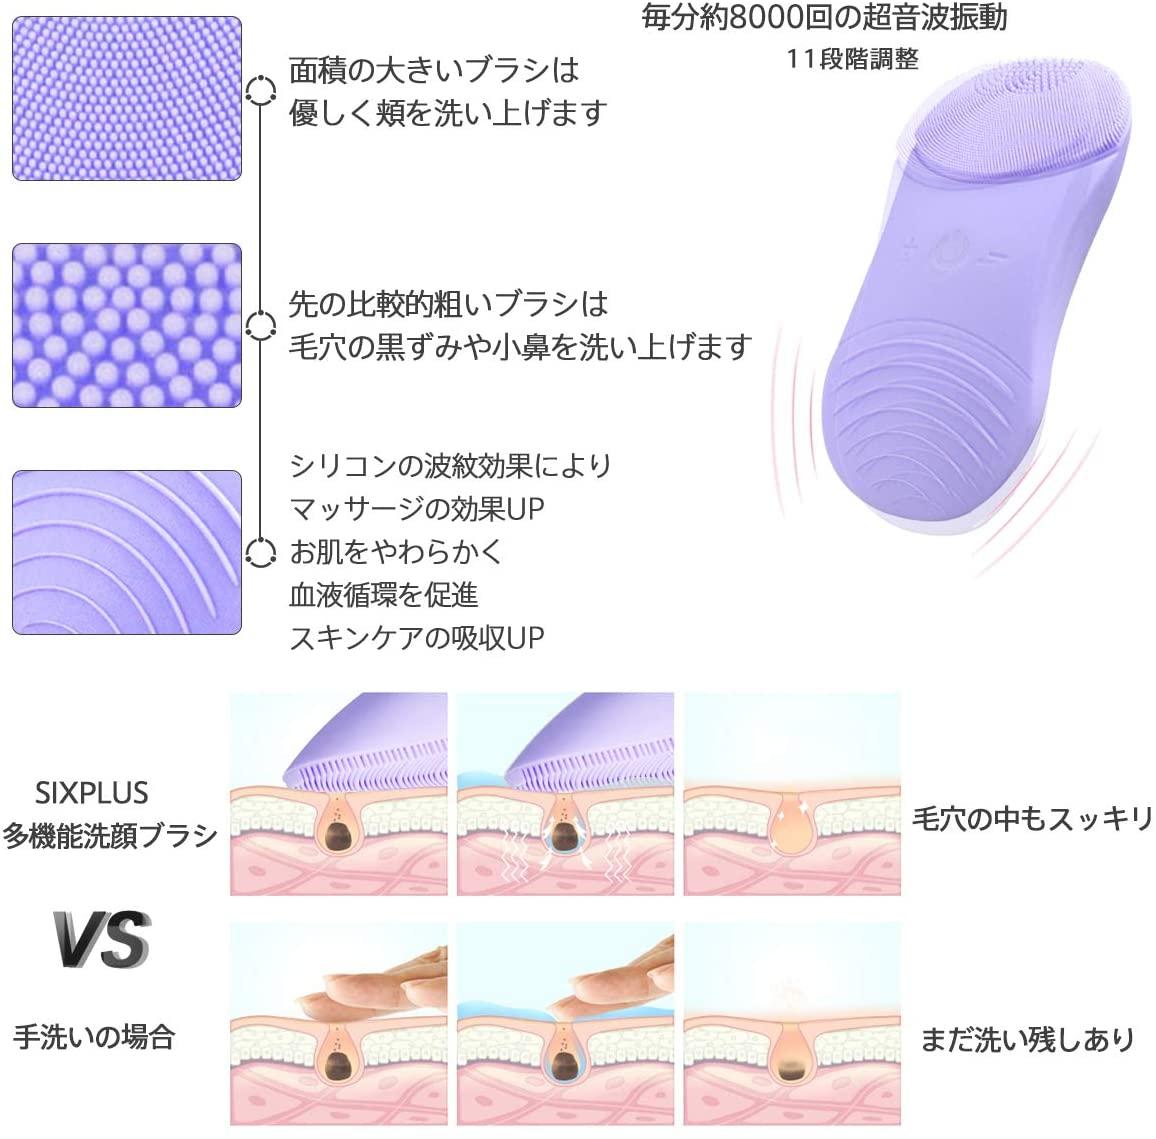 SIXPLUS(シックスプラス) 多機能洗顔器の商品画像3